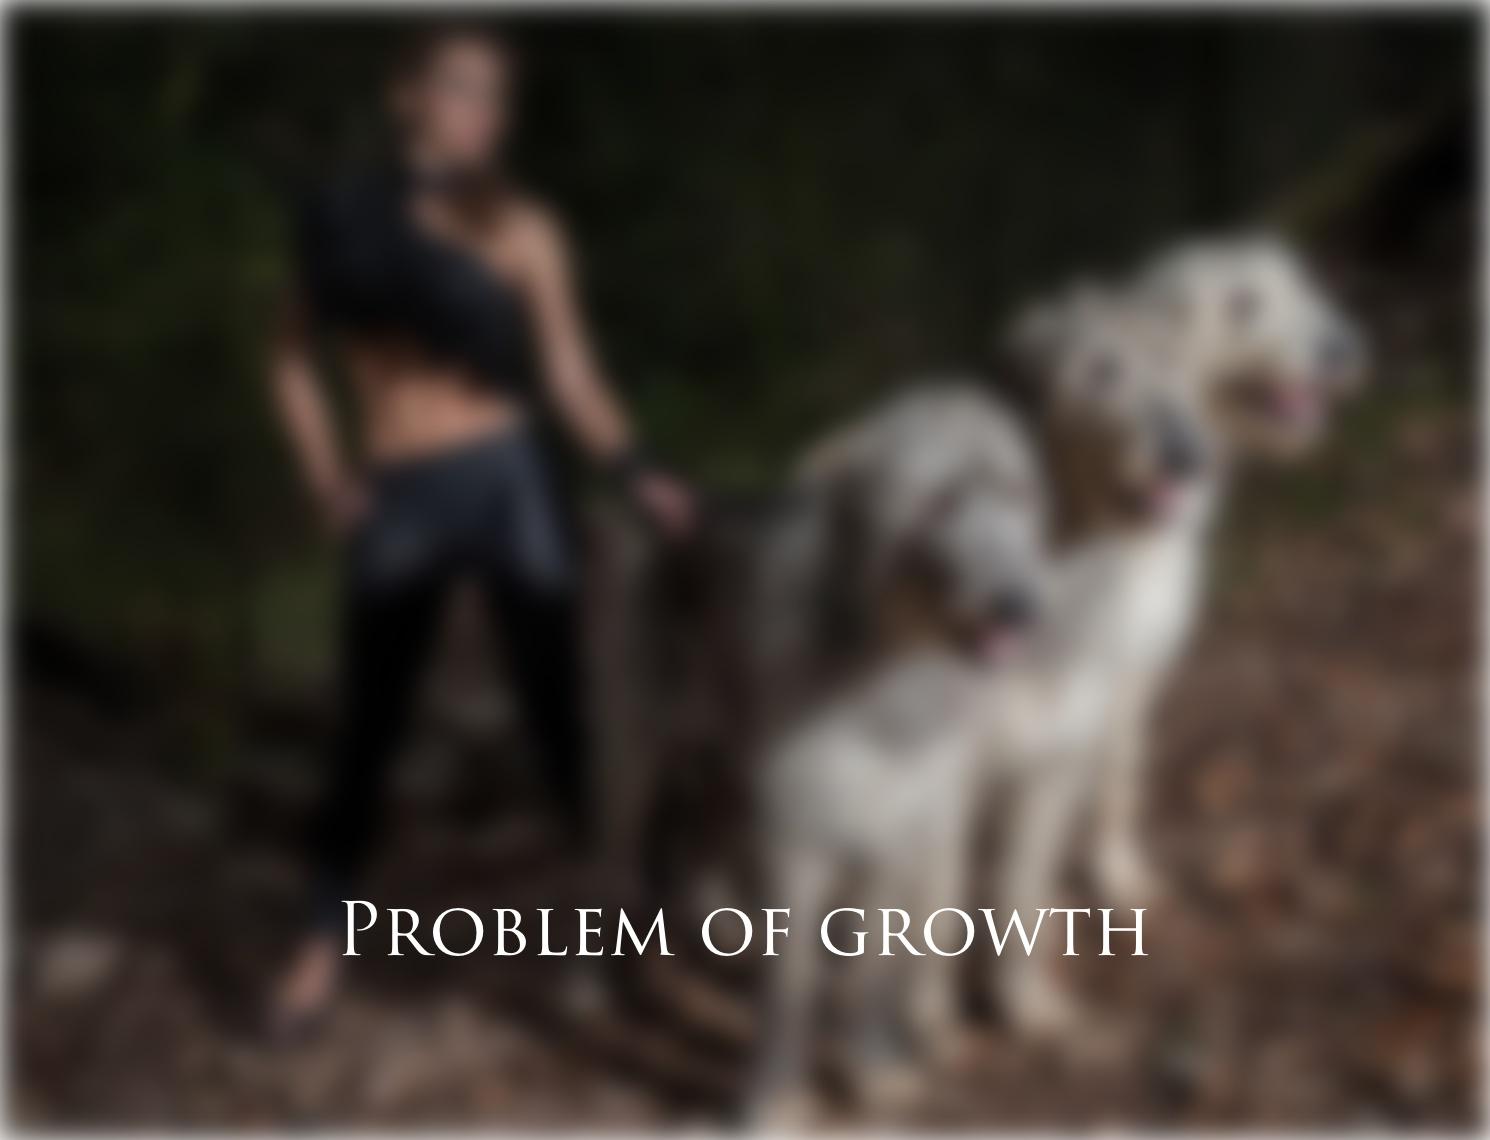 Проблема роста